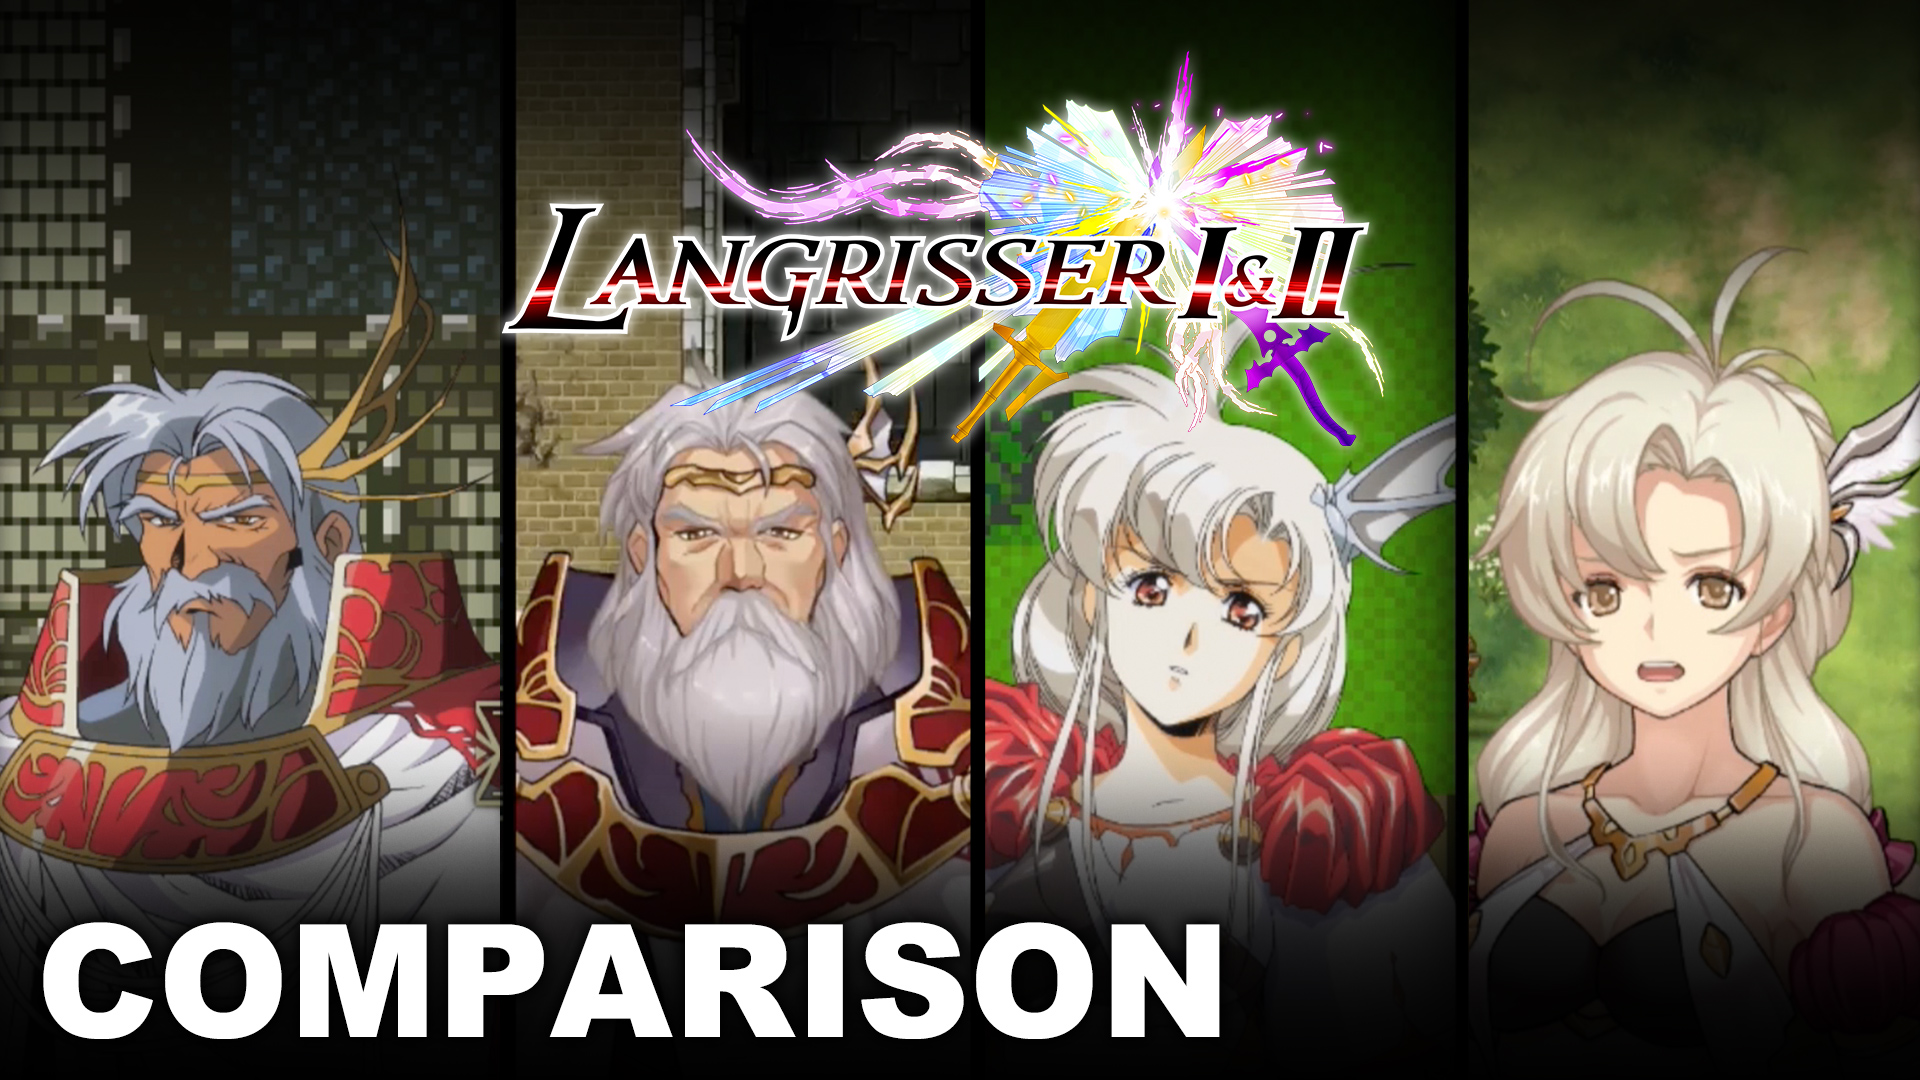 Risultato immagini per langrisser I & II comparisons